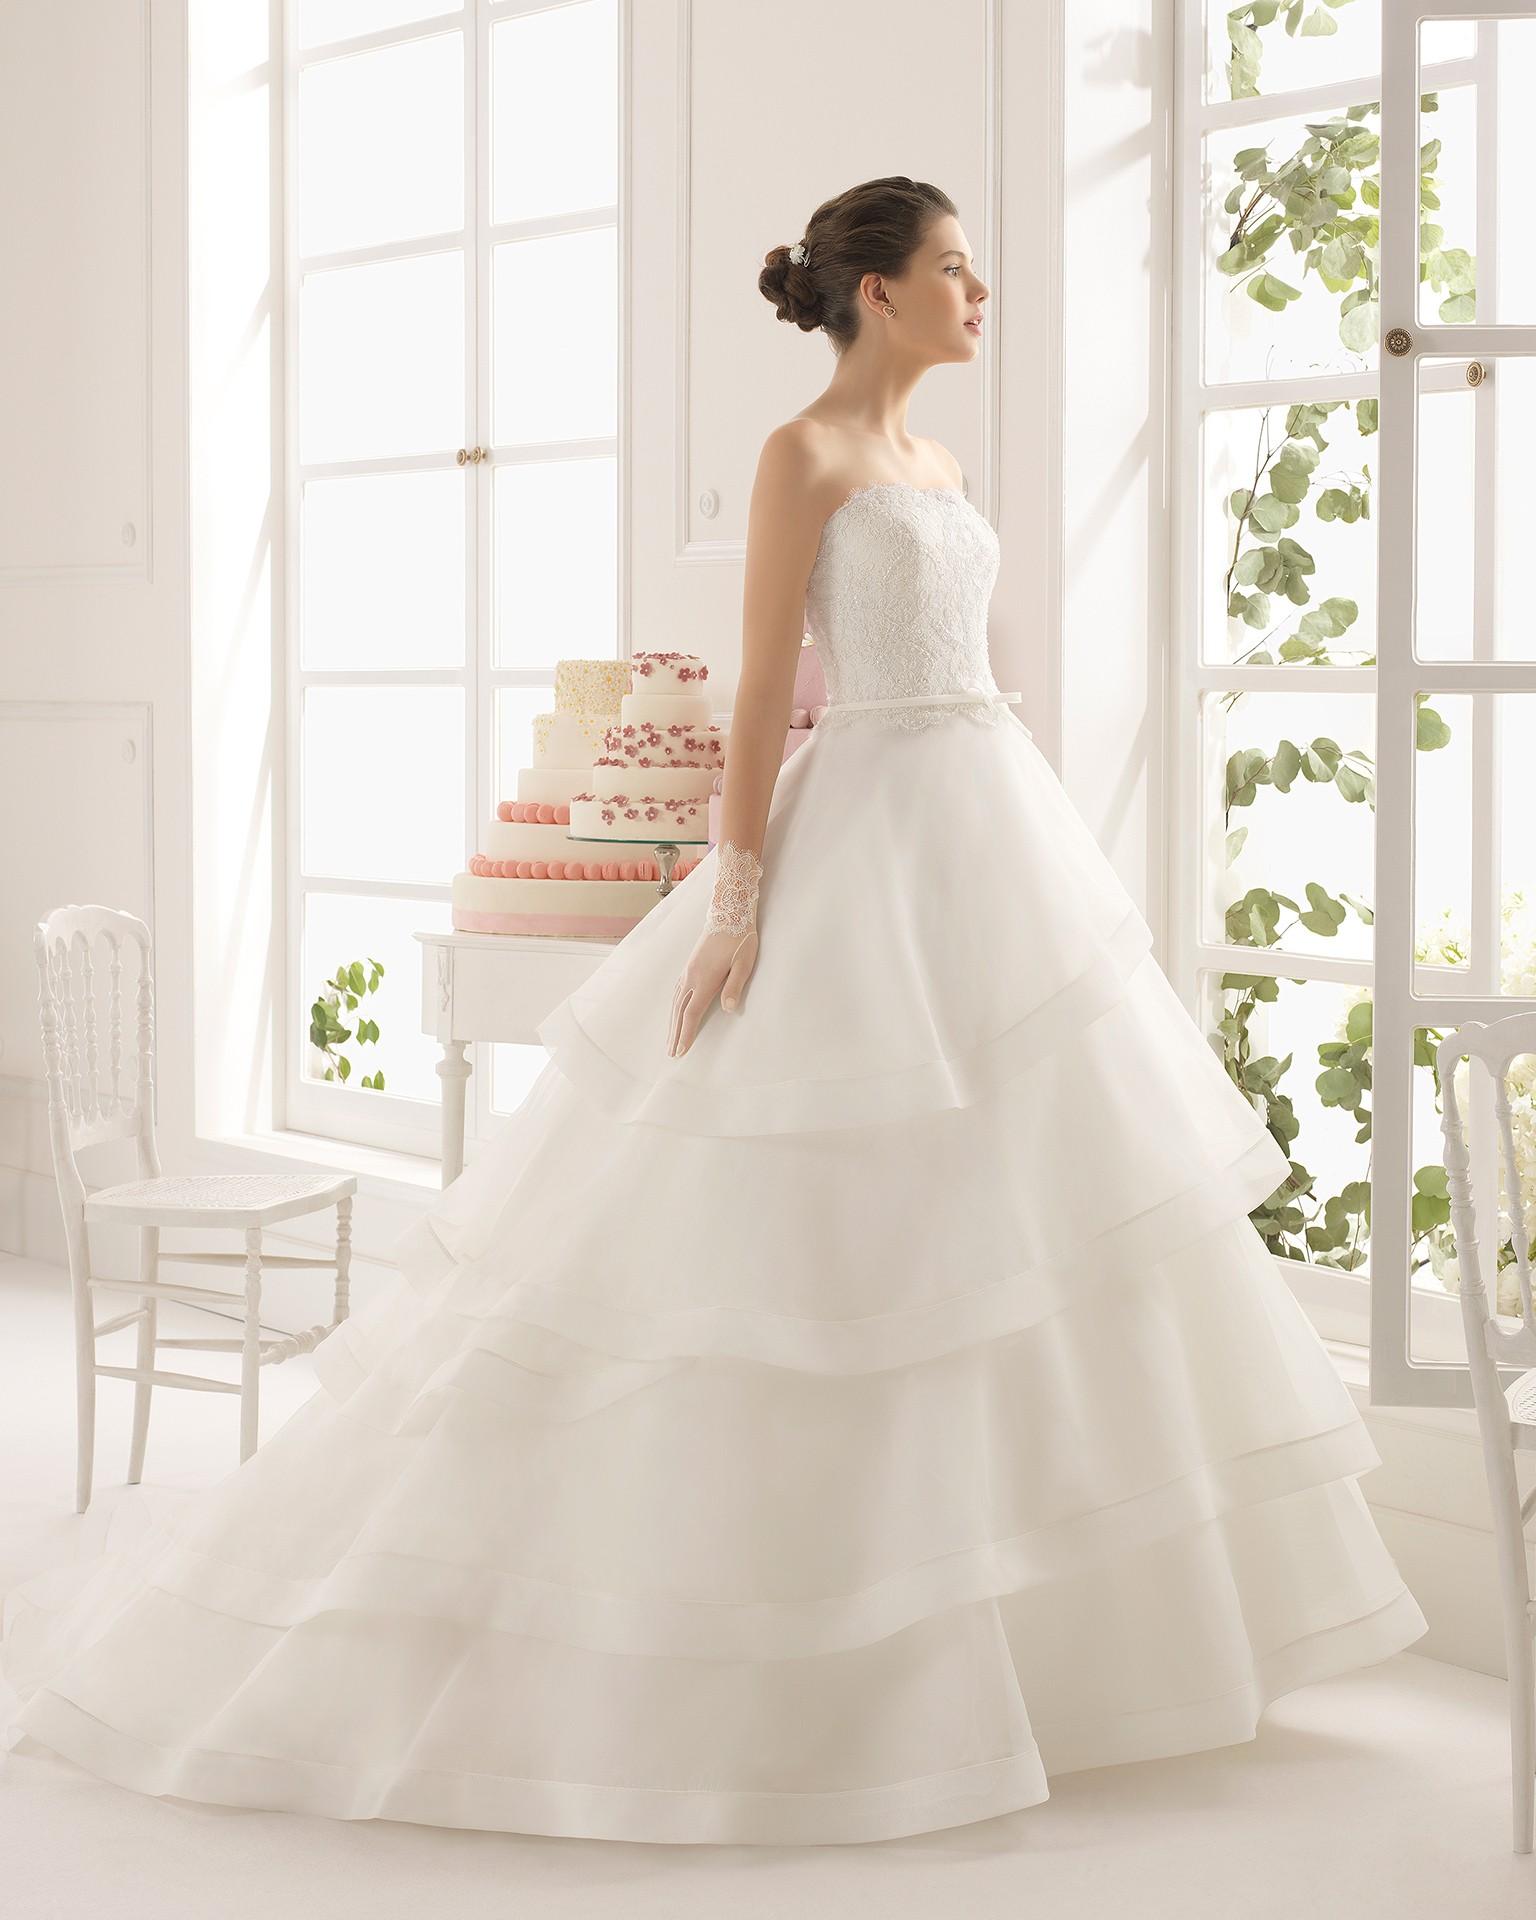 Sofisticado vestido de novia con volantes